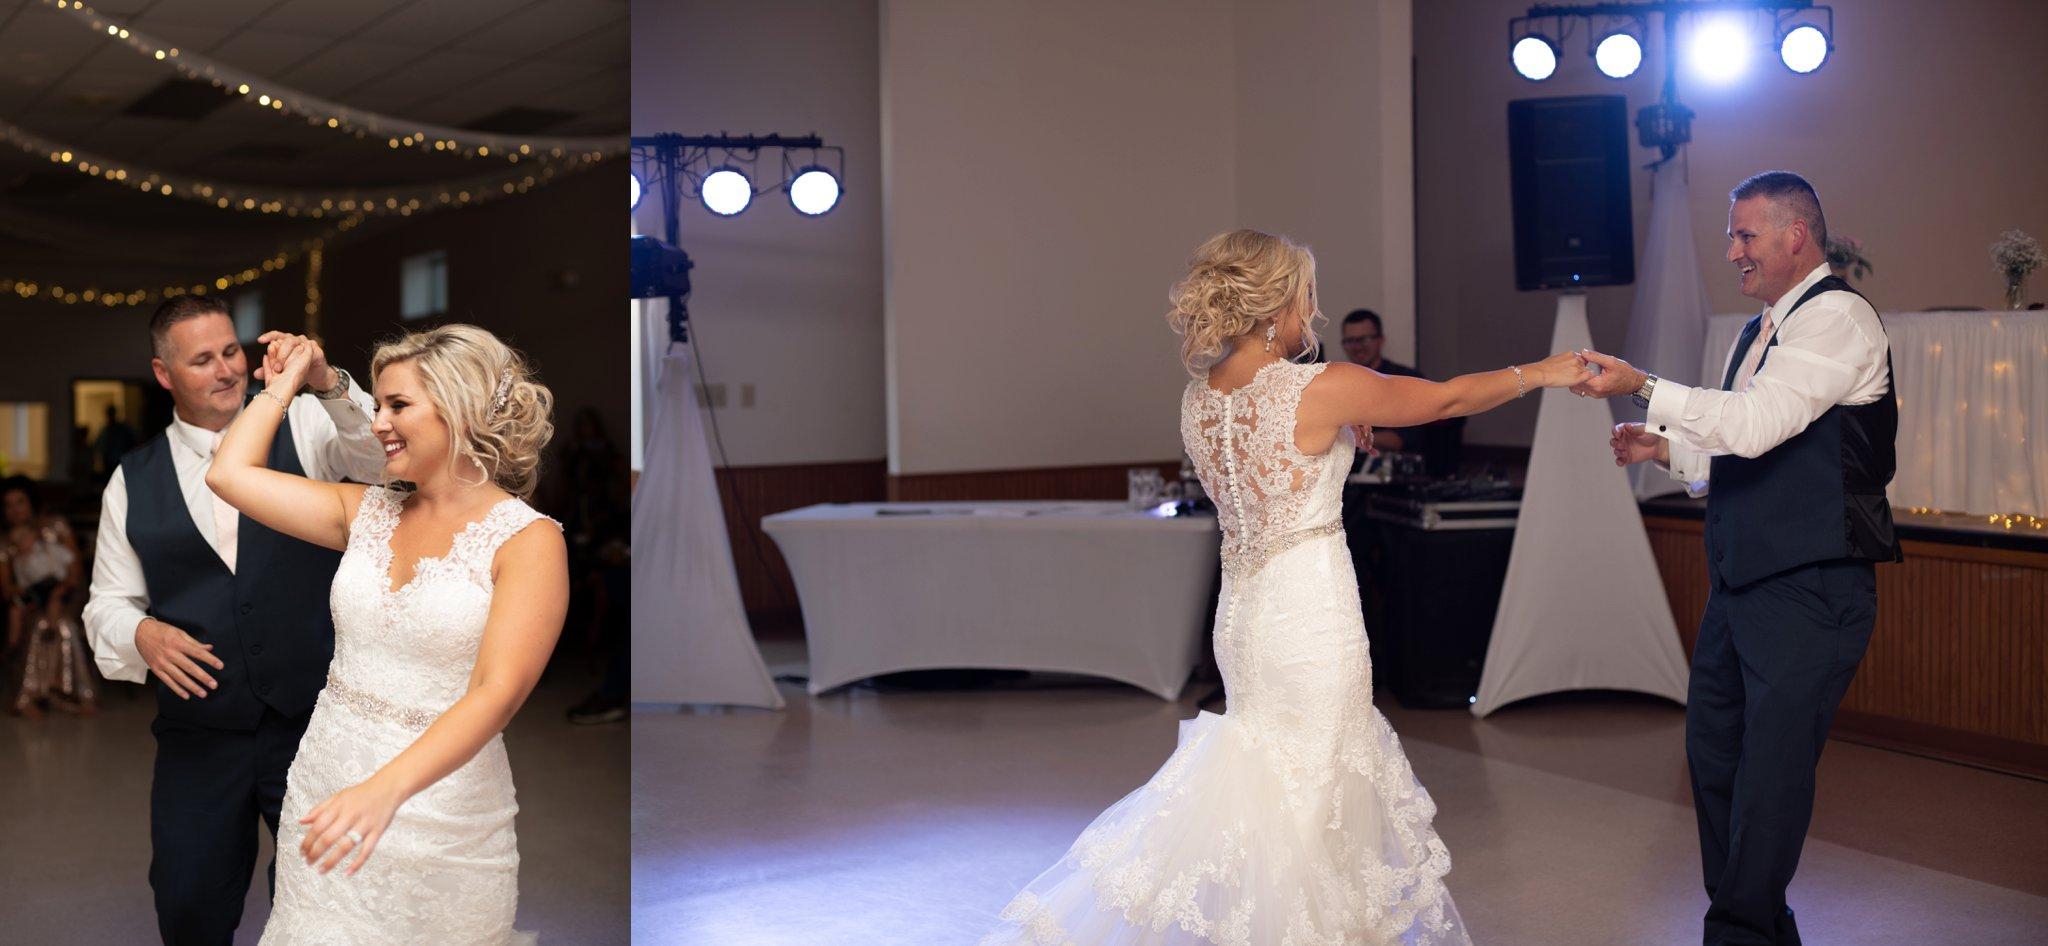 daddy daughter dance at wedding reception